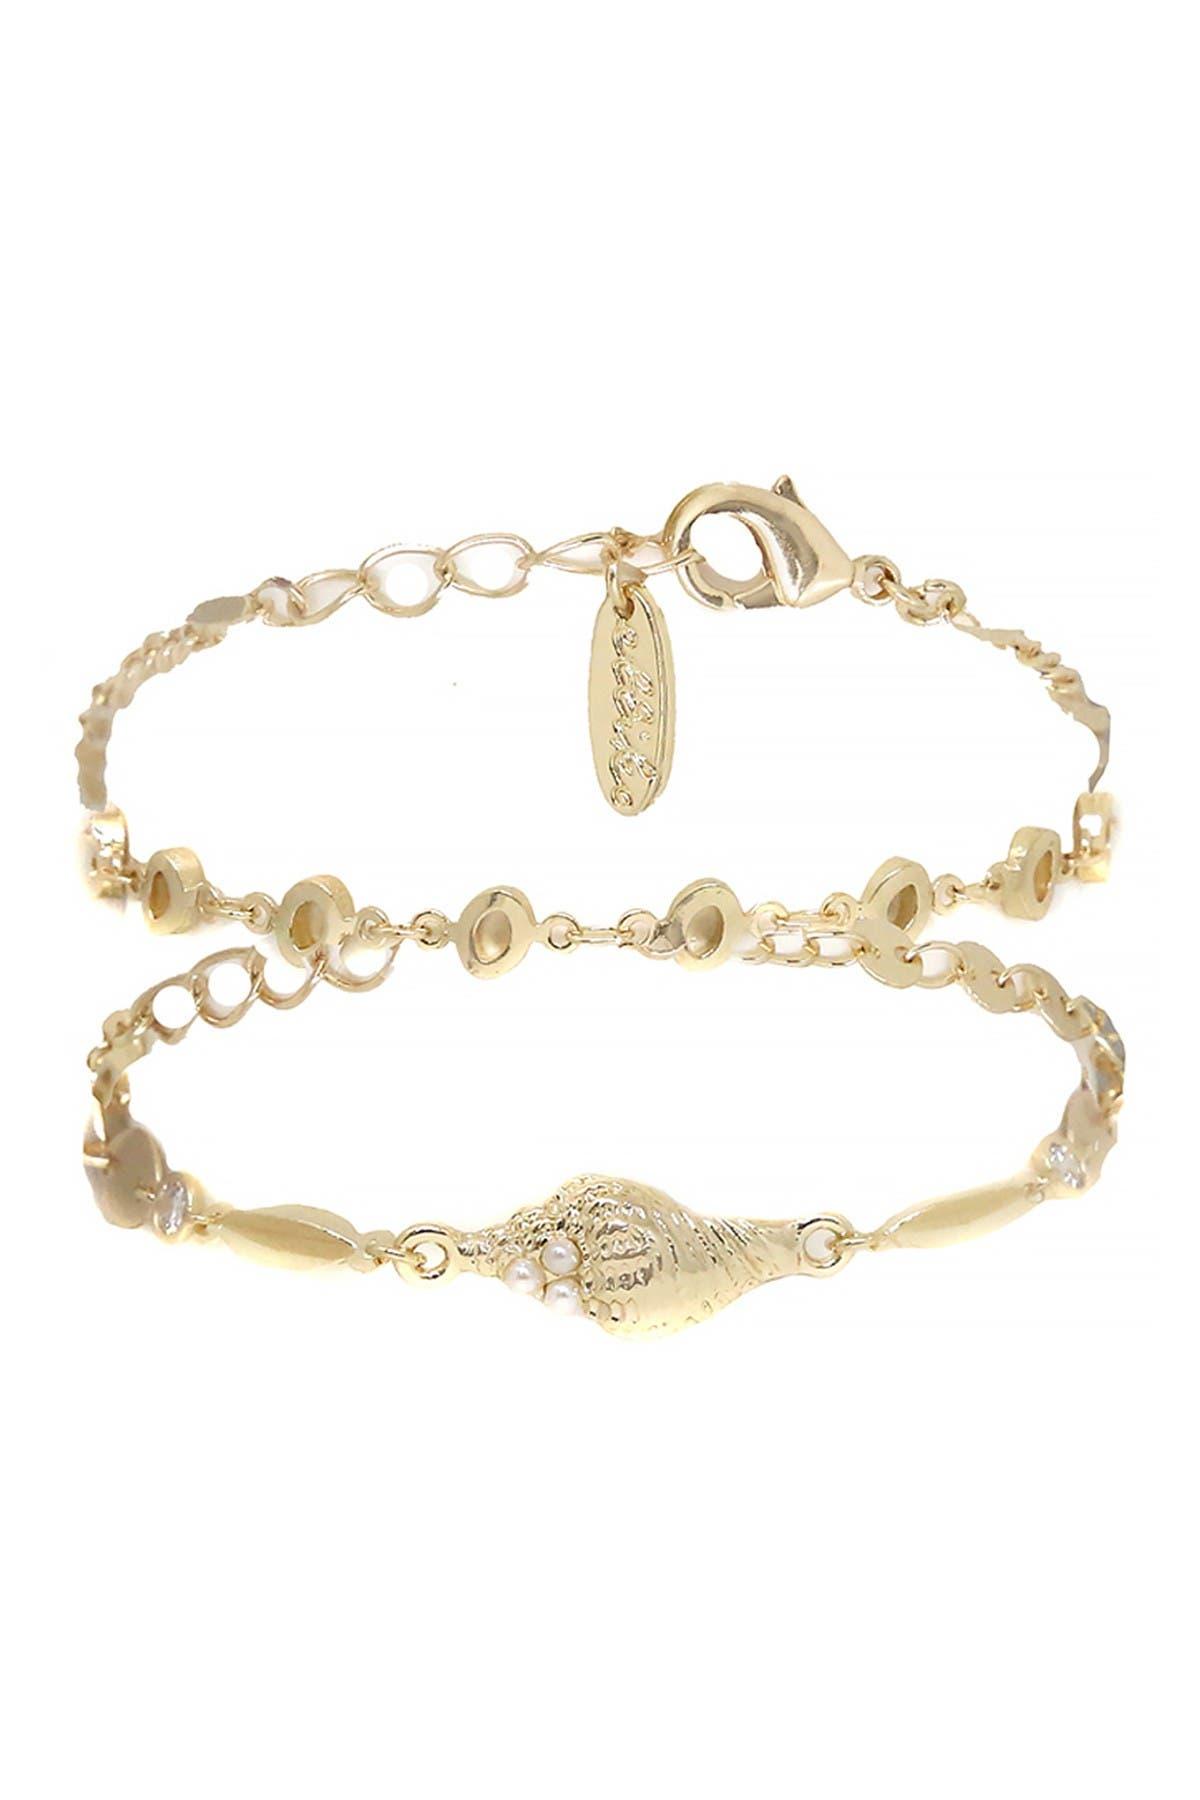 Image of Ettika Gold Beach Shell Pearl Bracelets - Set of 2